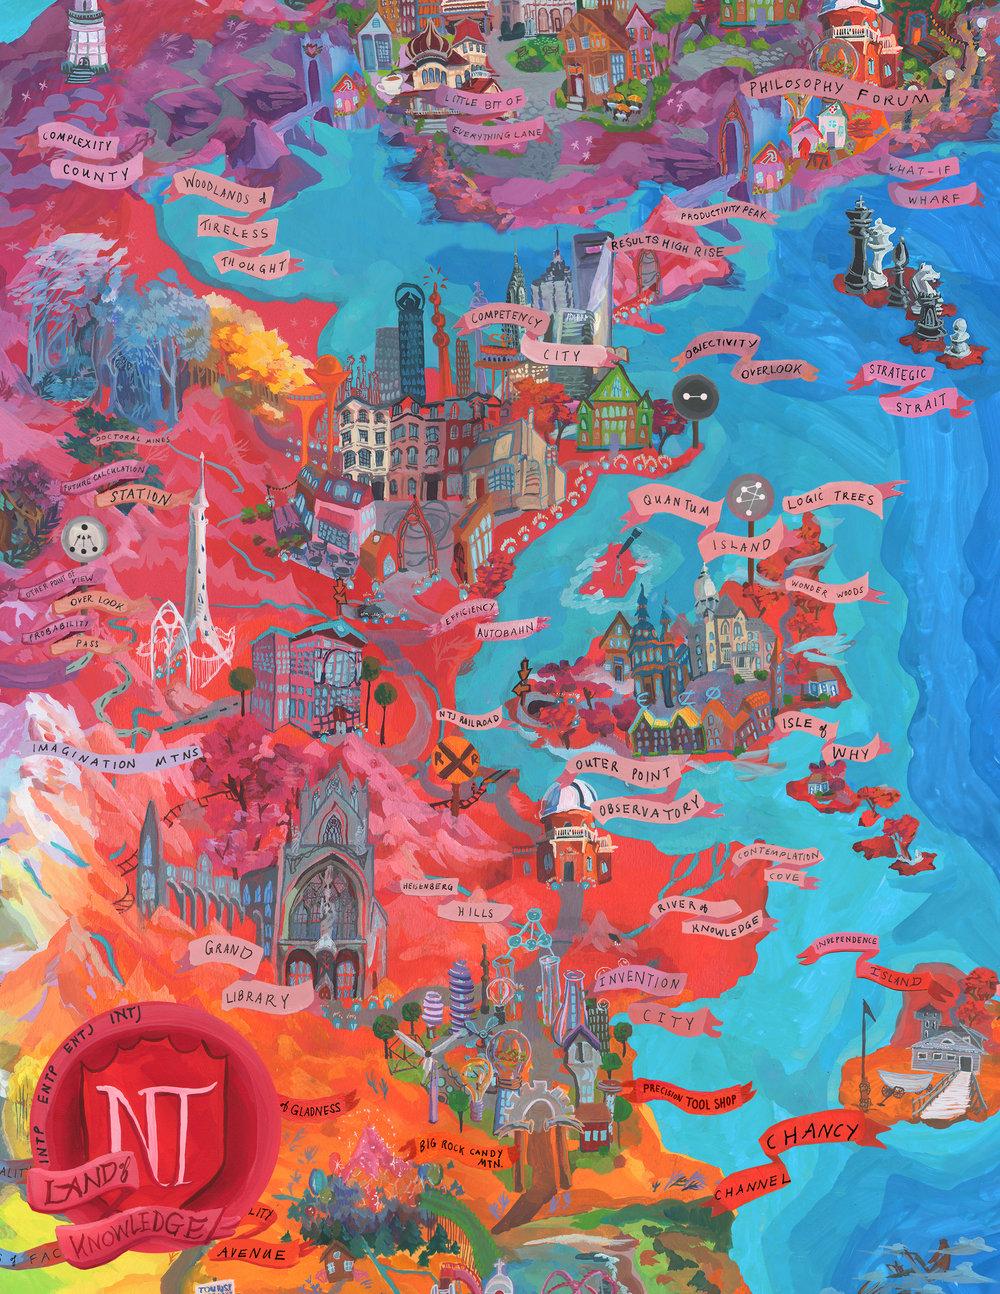 NT Land.jpg